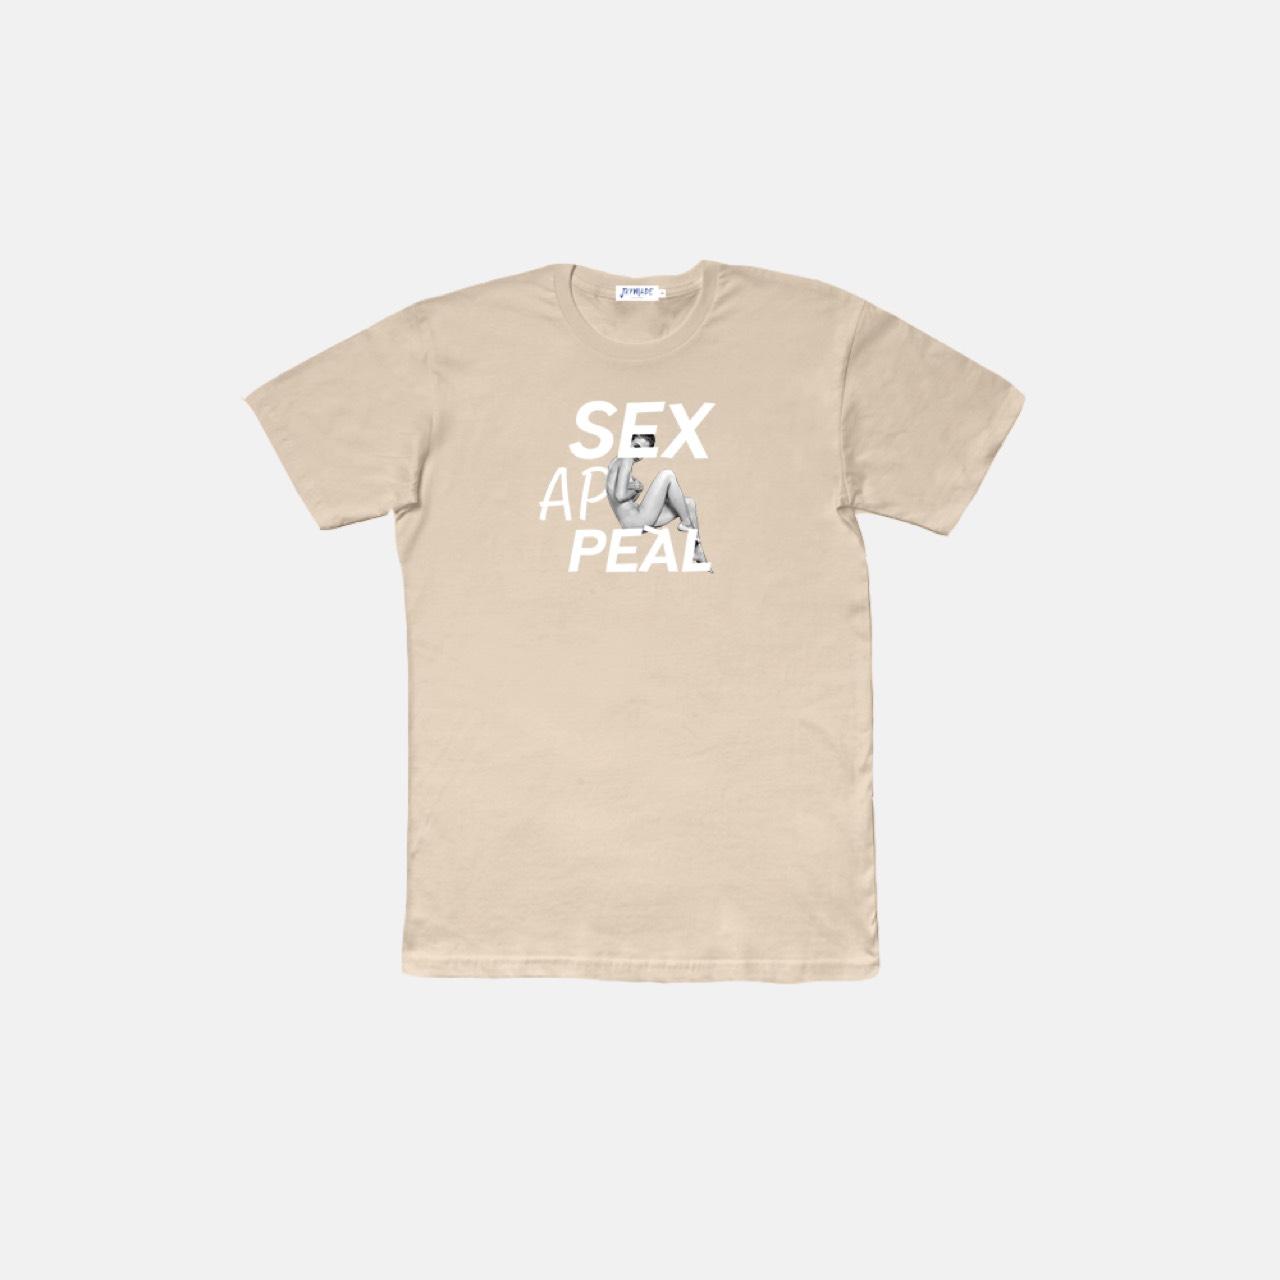 Tshirt,เสื้อยืด